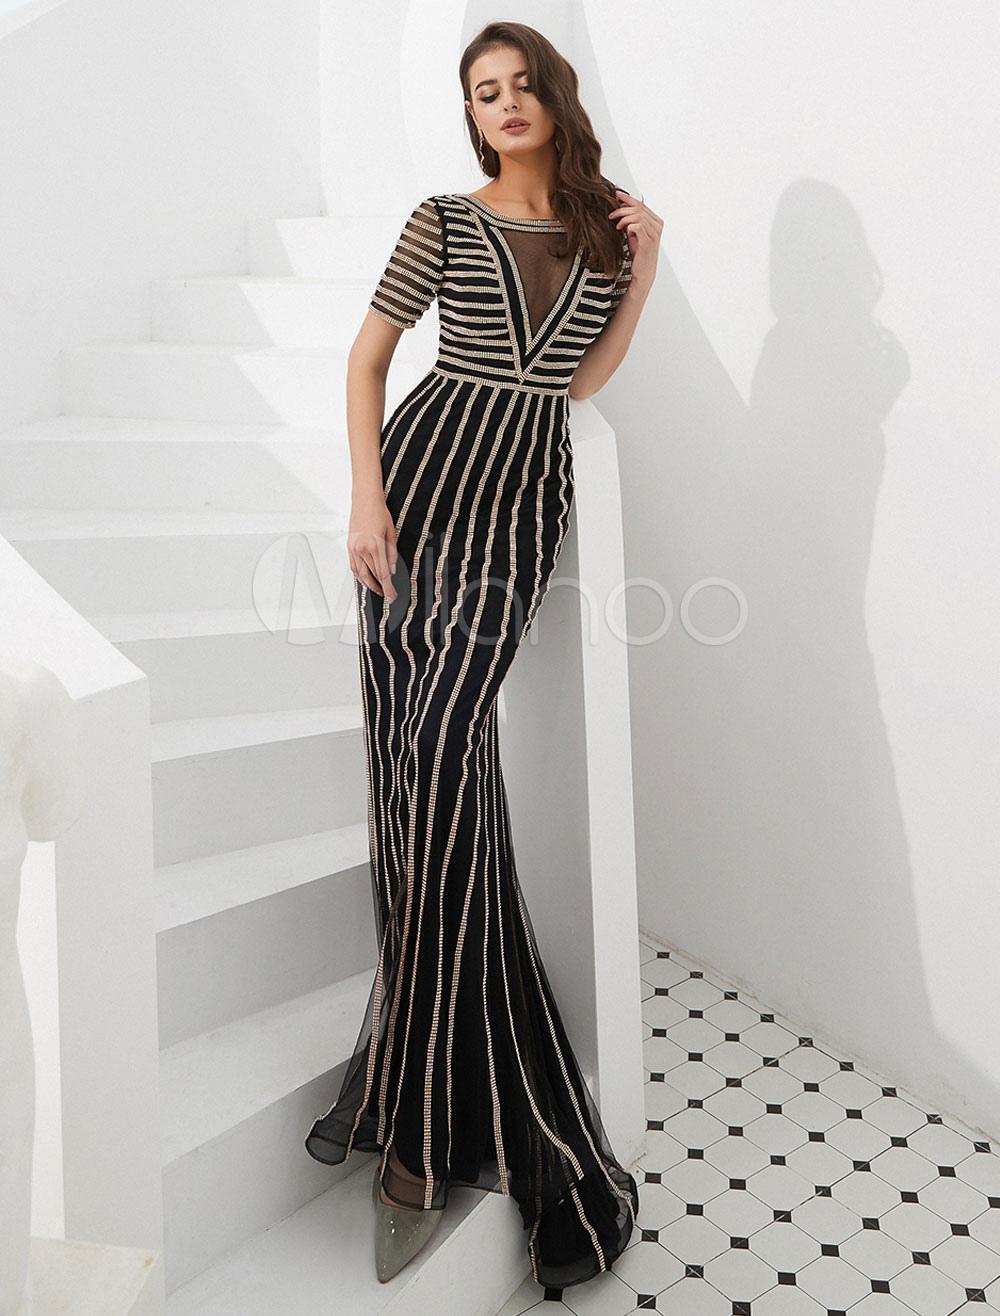 2e09d6f864871 Mermaid Evening Dresses Short Sleeve Beaded Stripes Illusion V Neck Formal Occasion  Dress-No.